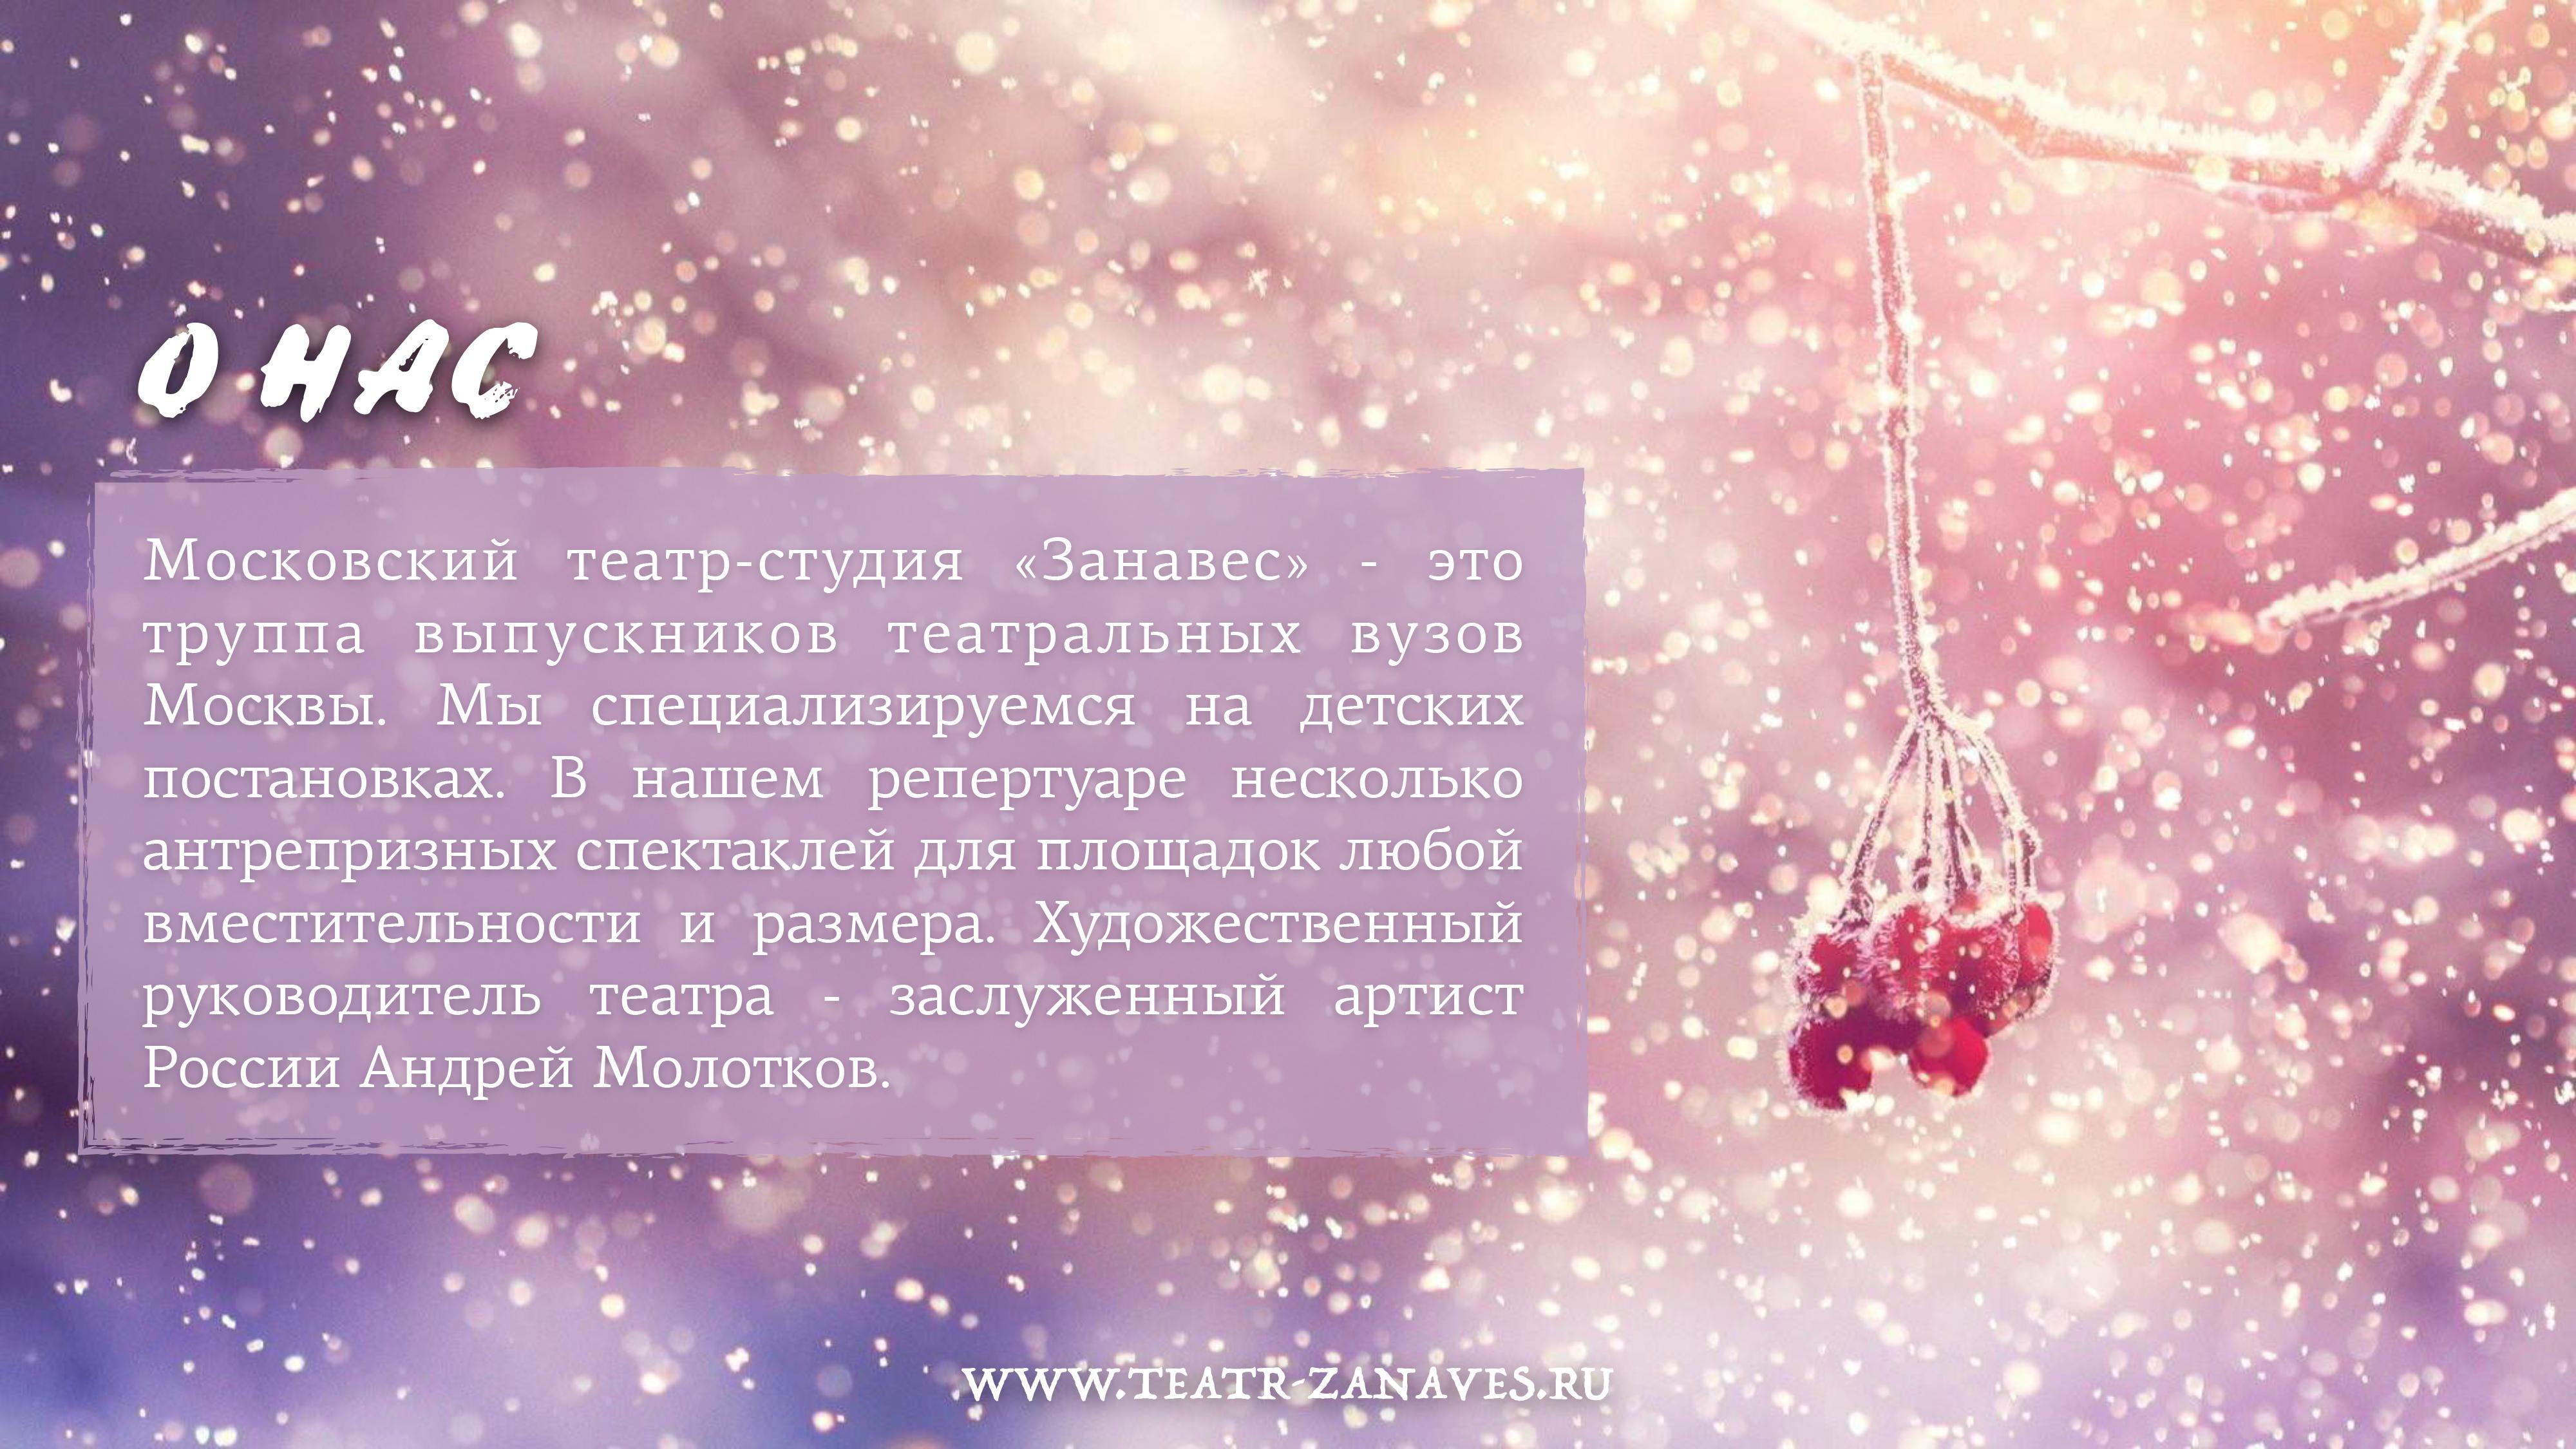 Spektakl-Moroz-Ivanovich-2